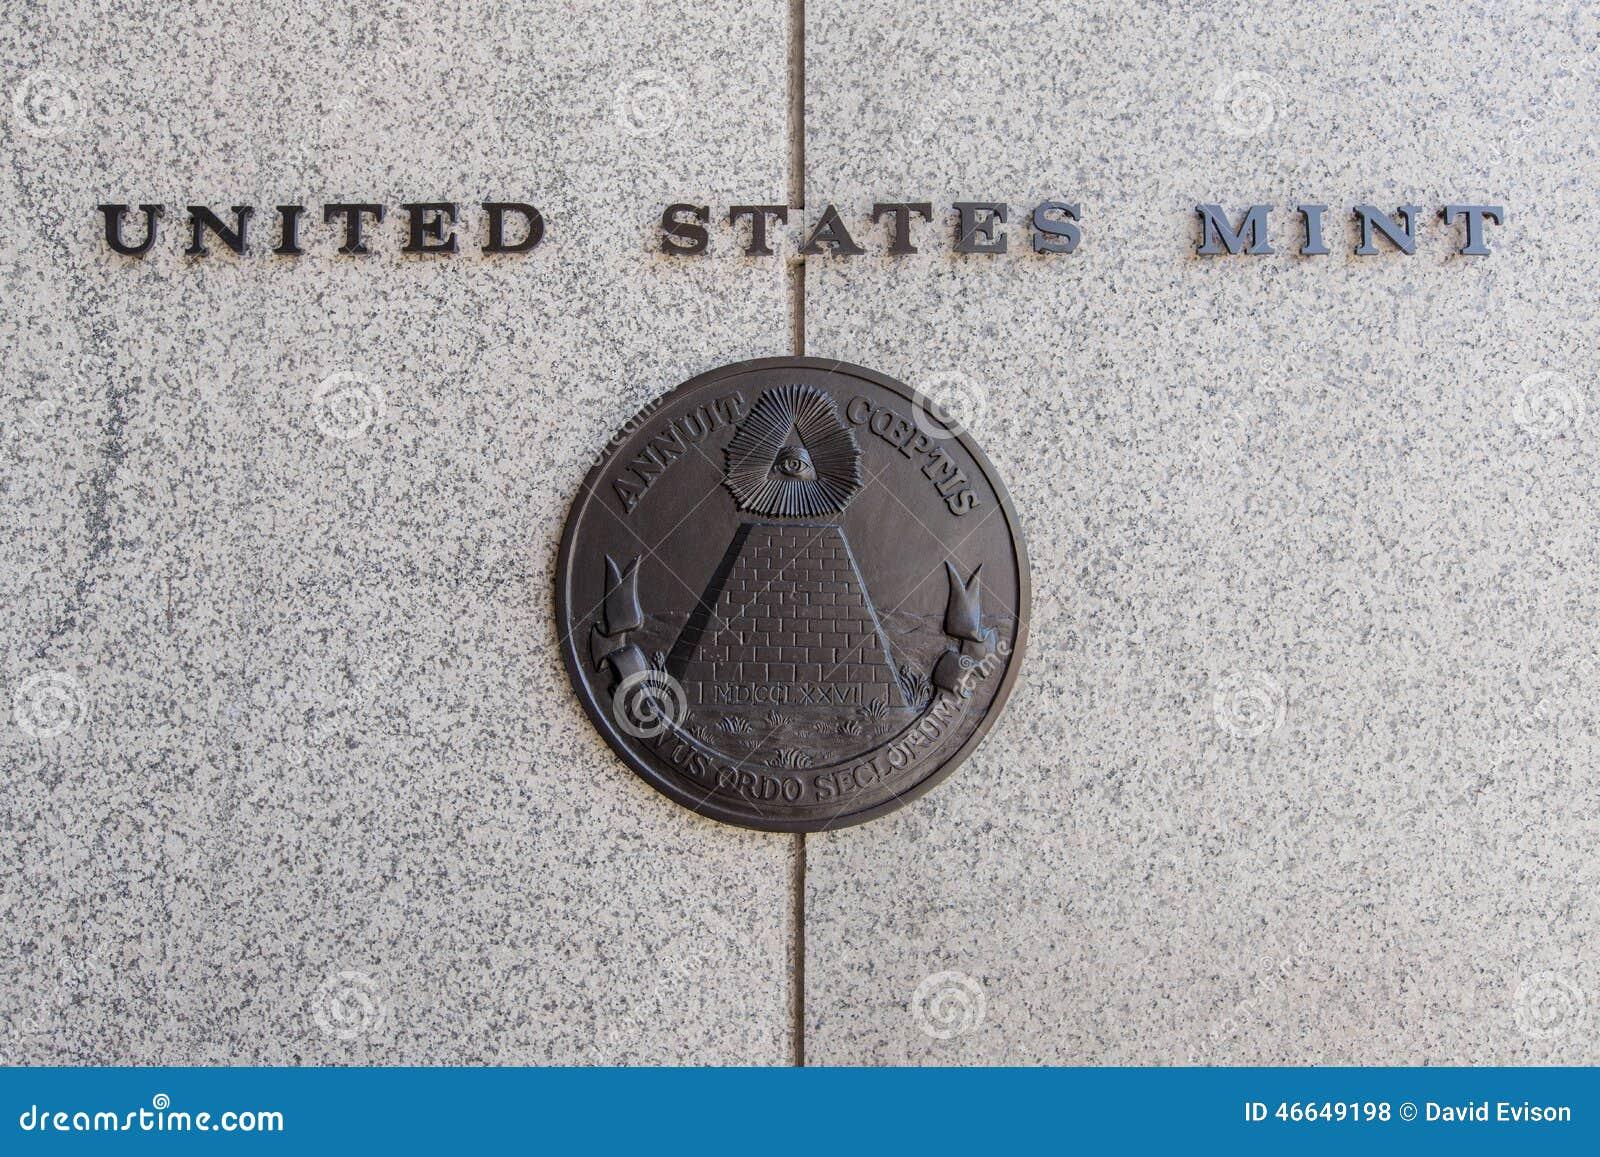 United States Mint.